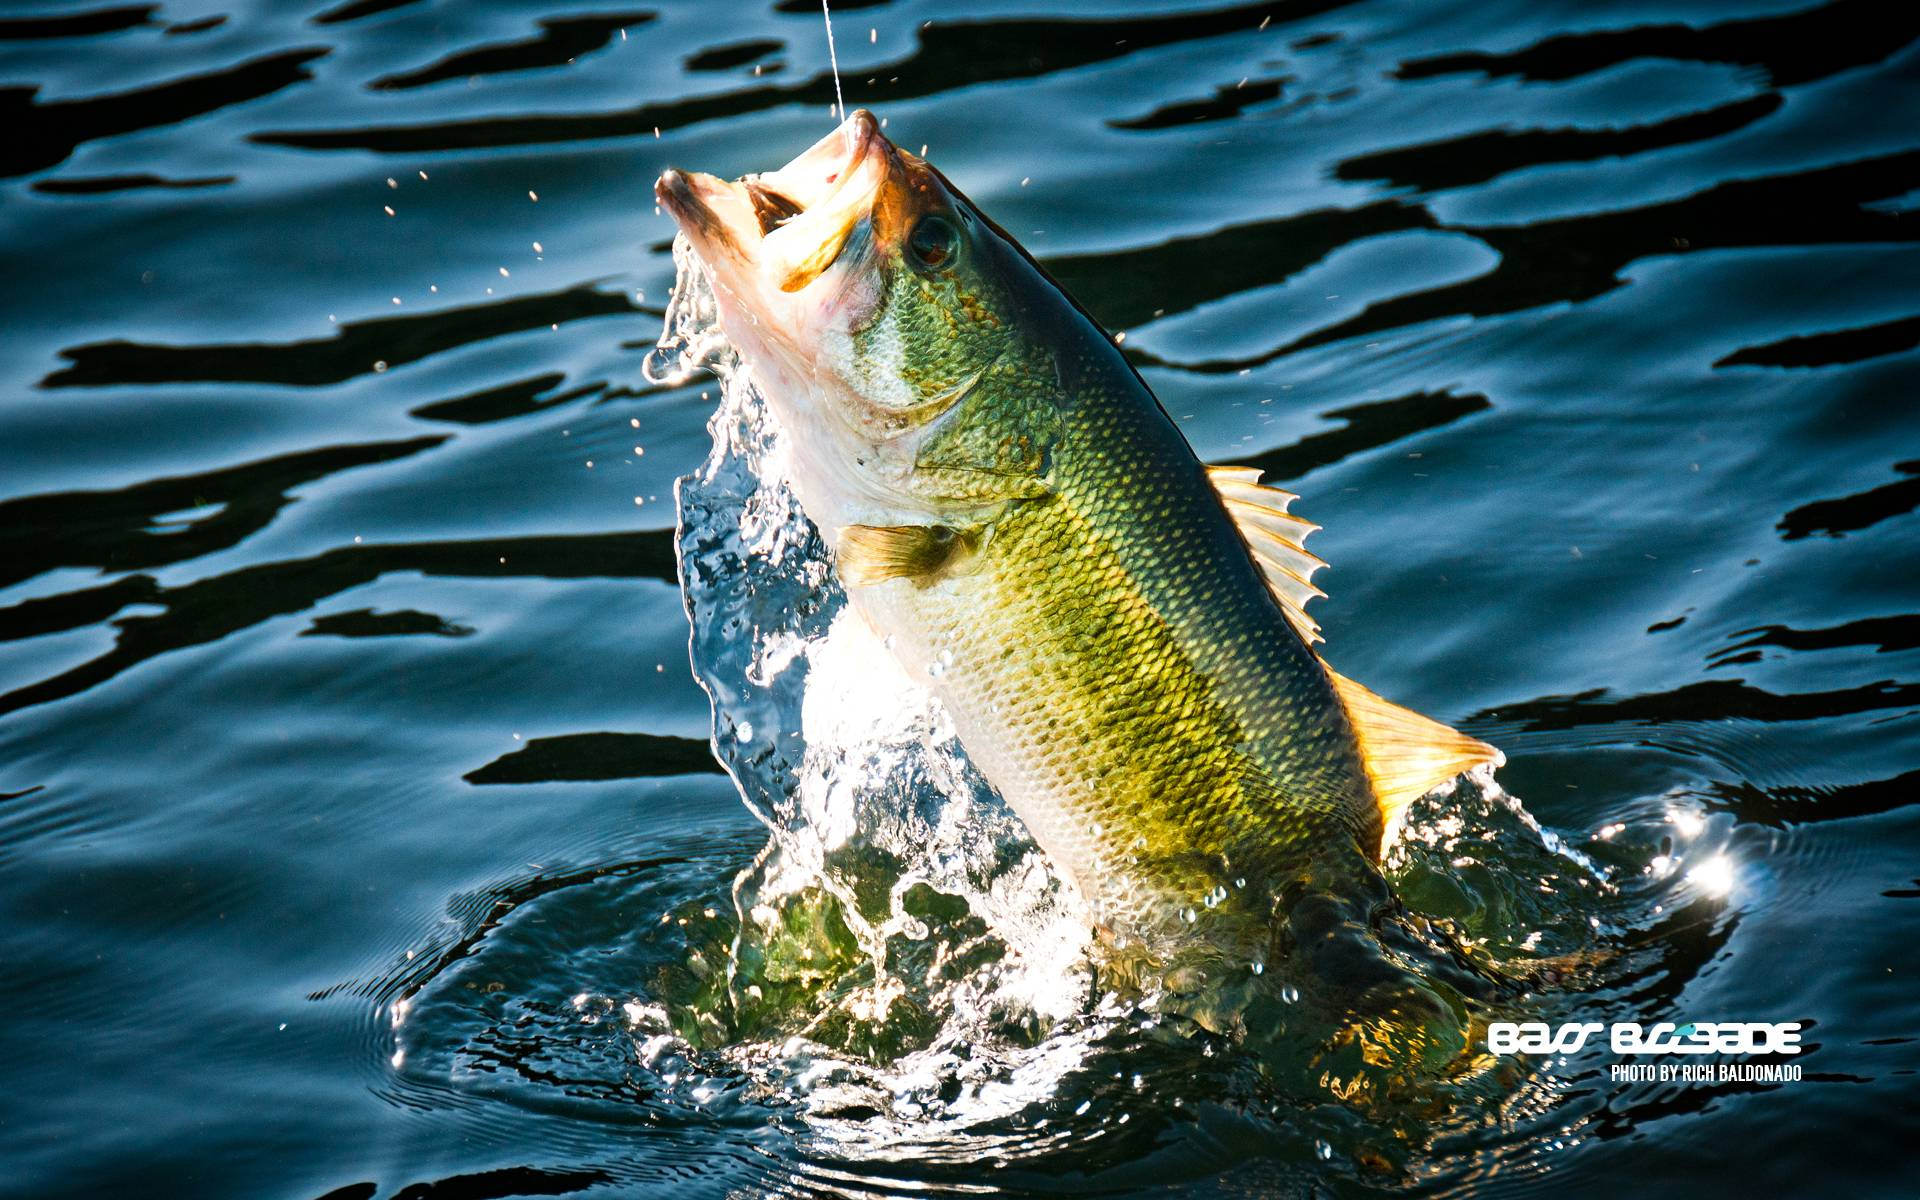 Bass Fishing Wallpaper Backgrounds 1920x1200